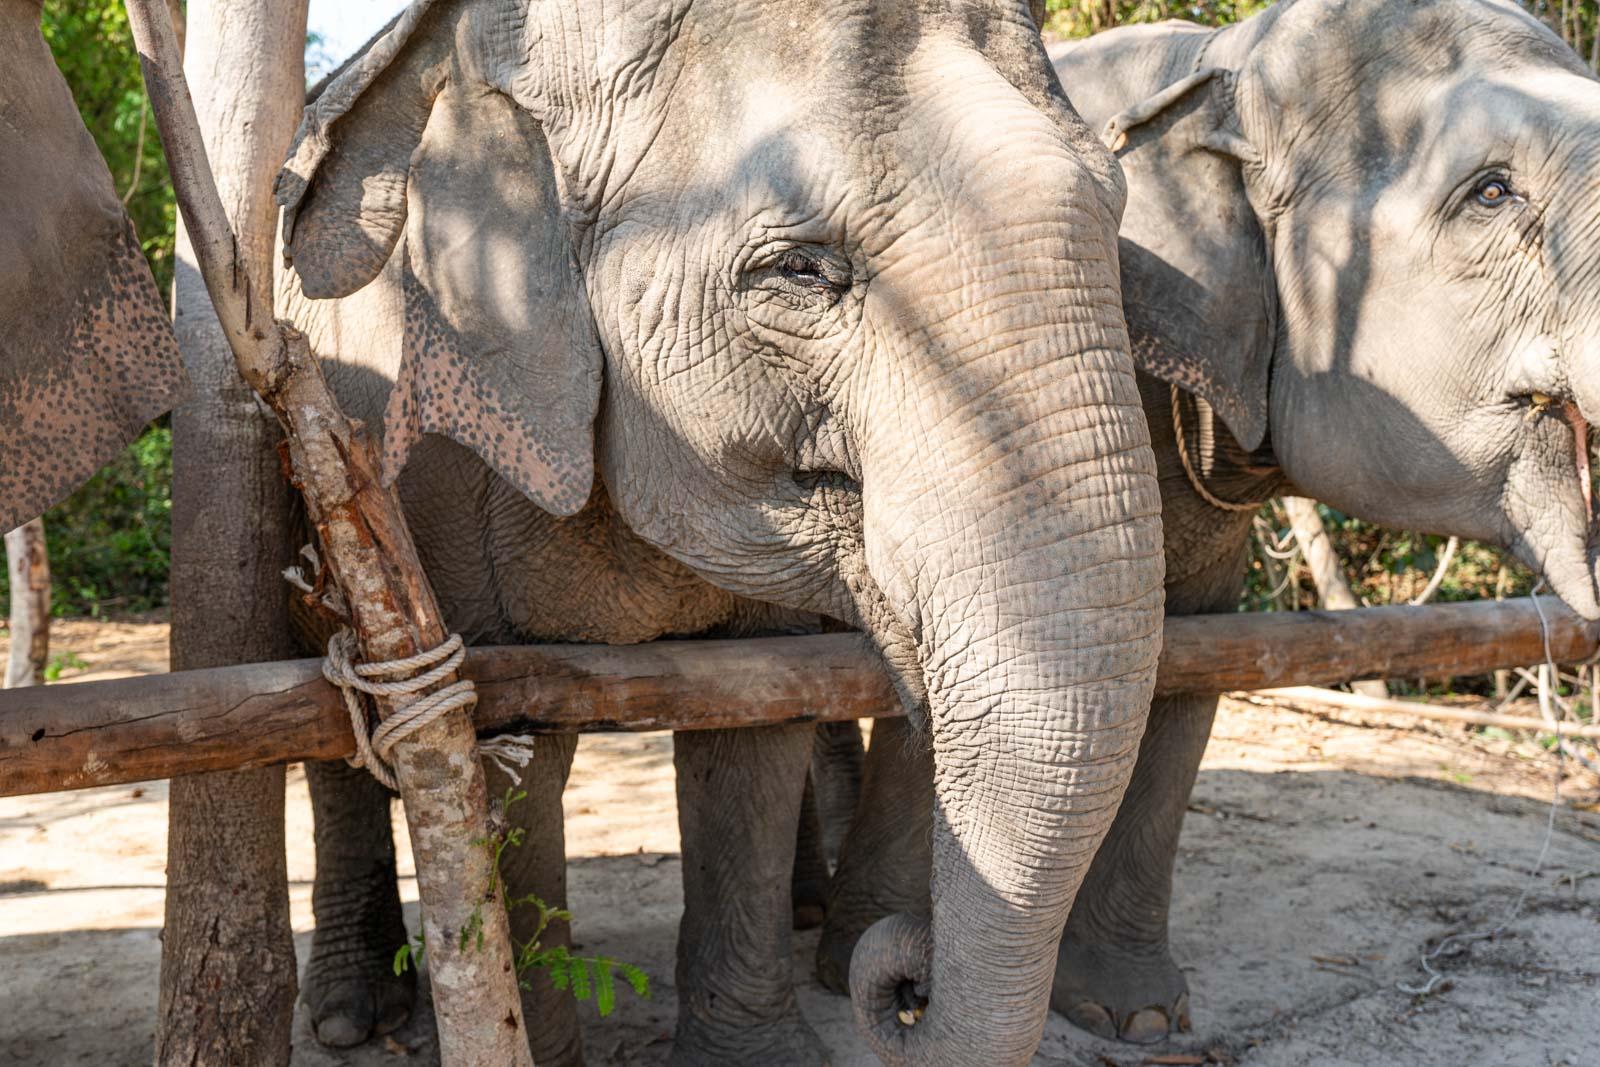 Kulen Elephant Forest, Siem Reap, Cambodia